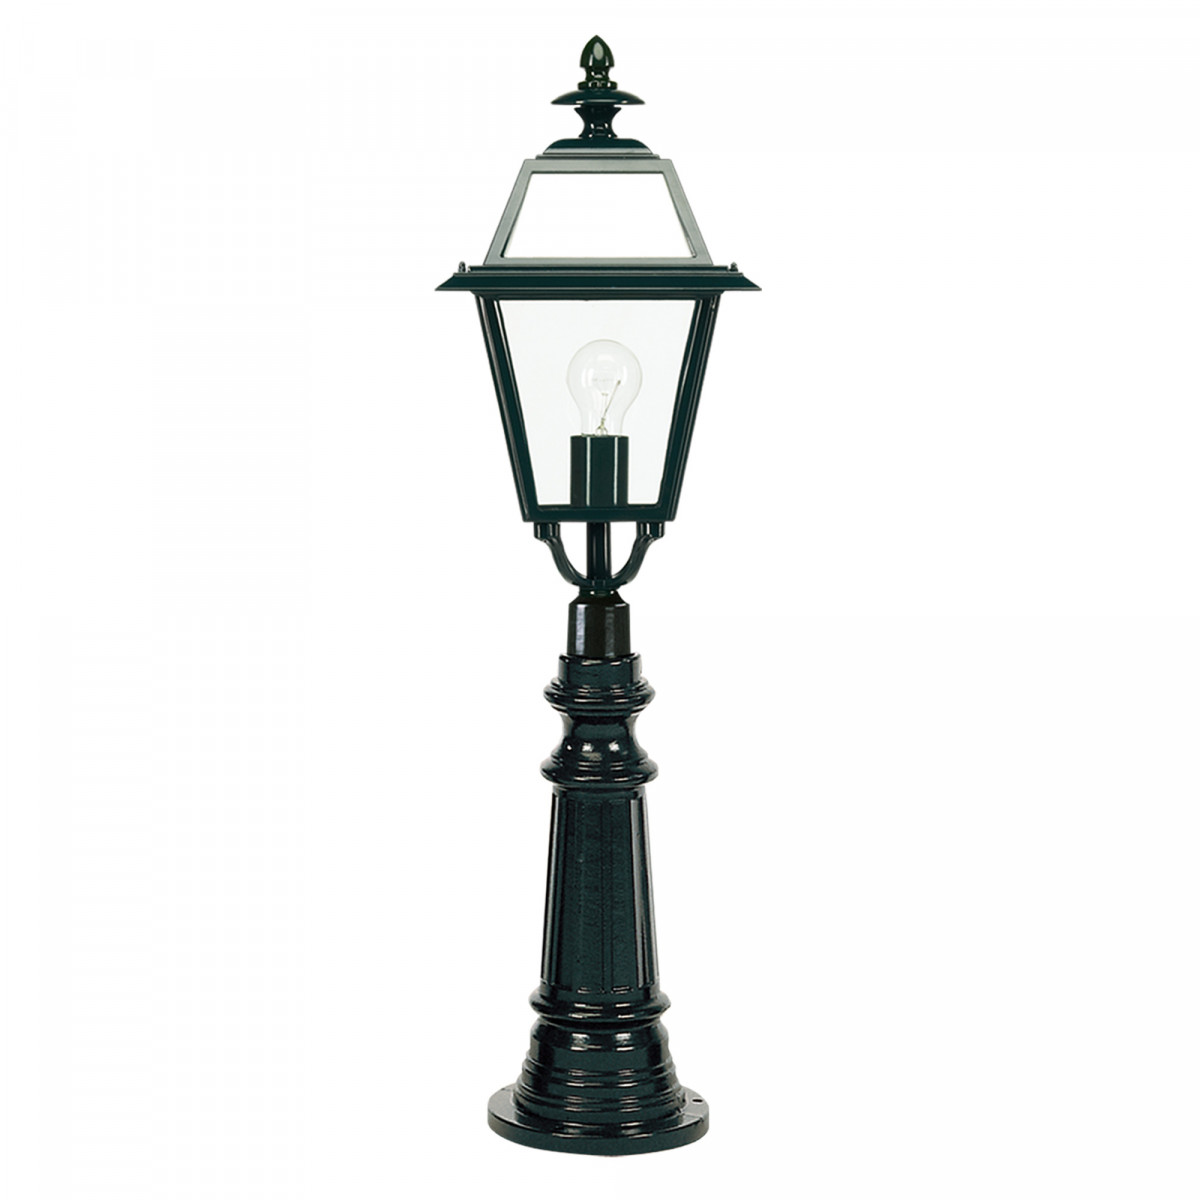 Tuinlamp Mechelen